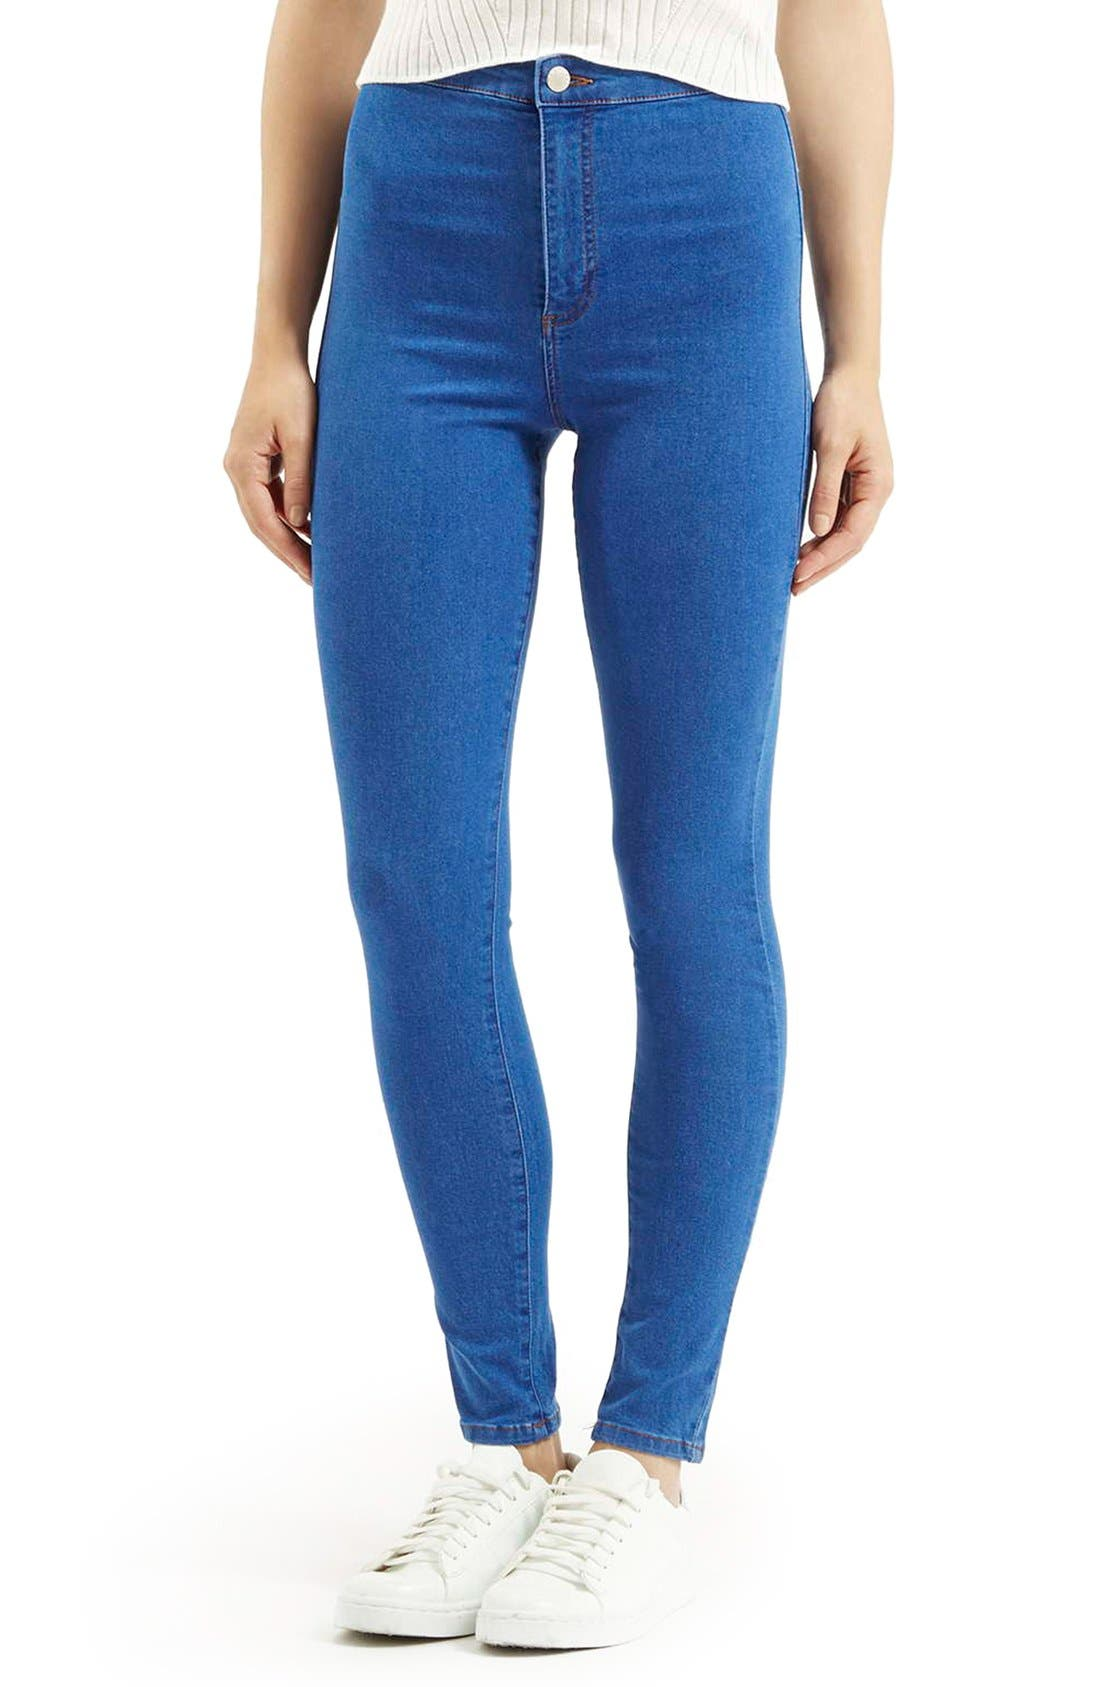 Alternate Image 1 Selected - Topshop Moto 'Joni' High Rise Skinny Jeans (Short)